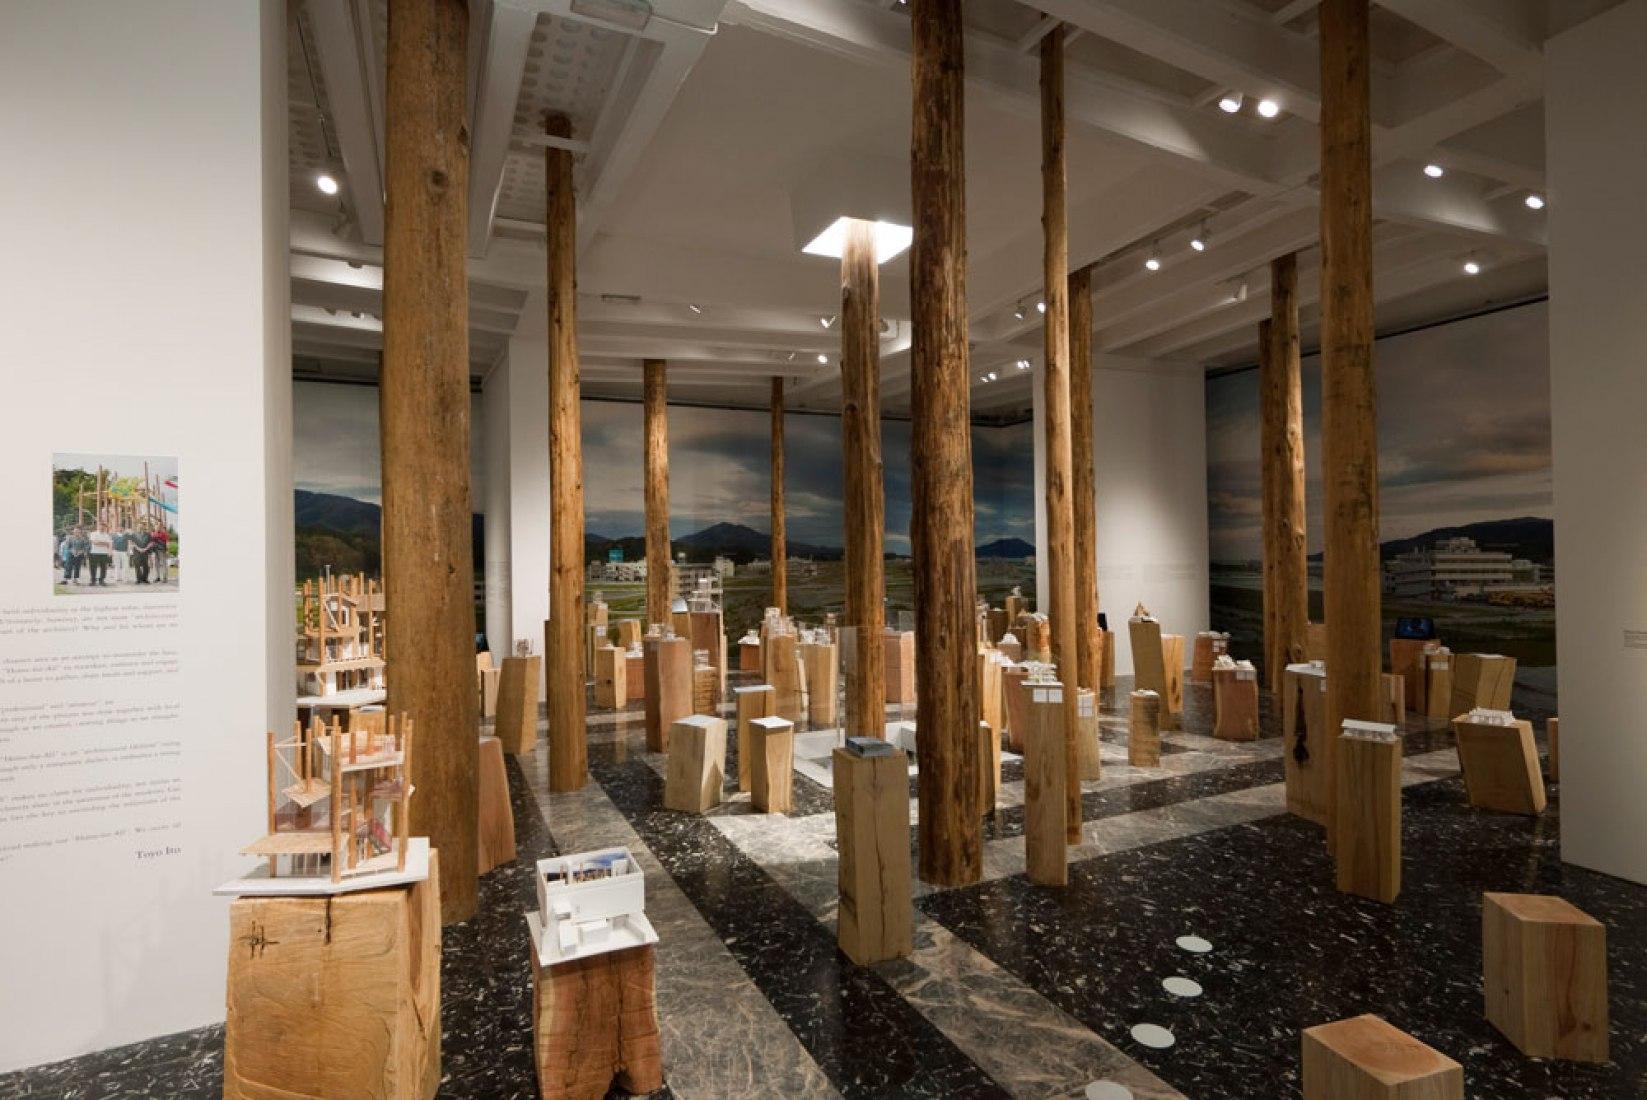 Installation view: Japan Pavilion, 13th International Architecture Exhibition Photography © Naoya Hatakeyama.